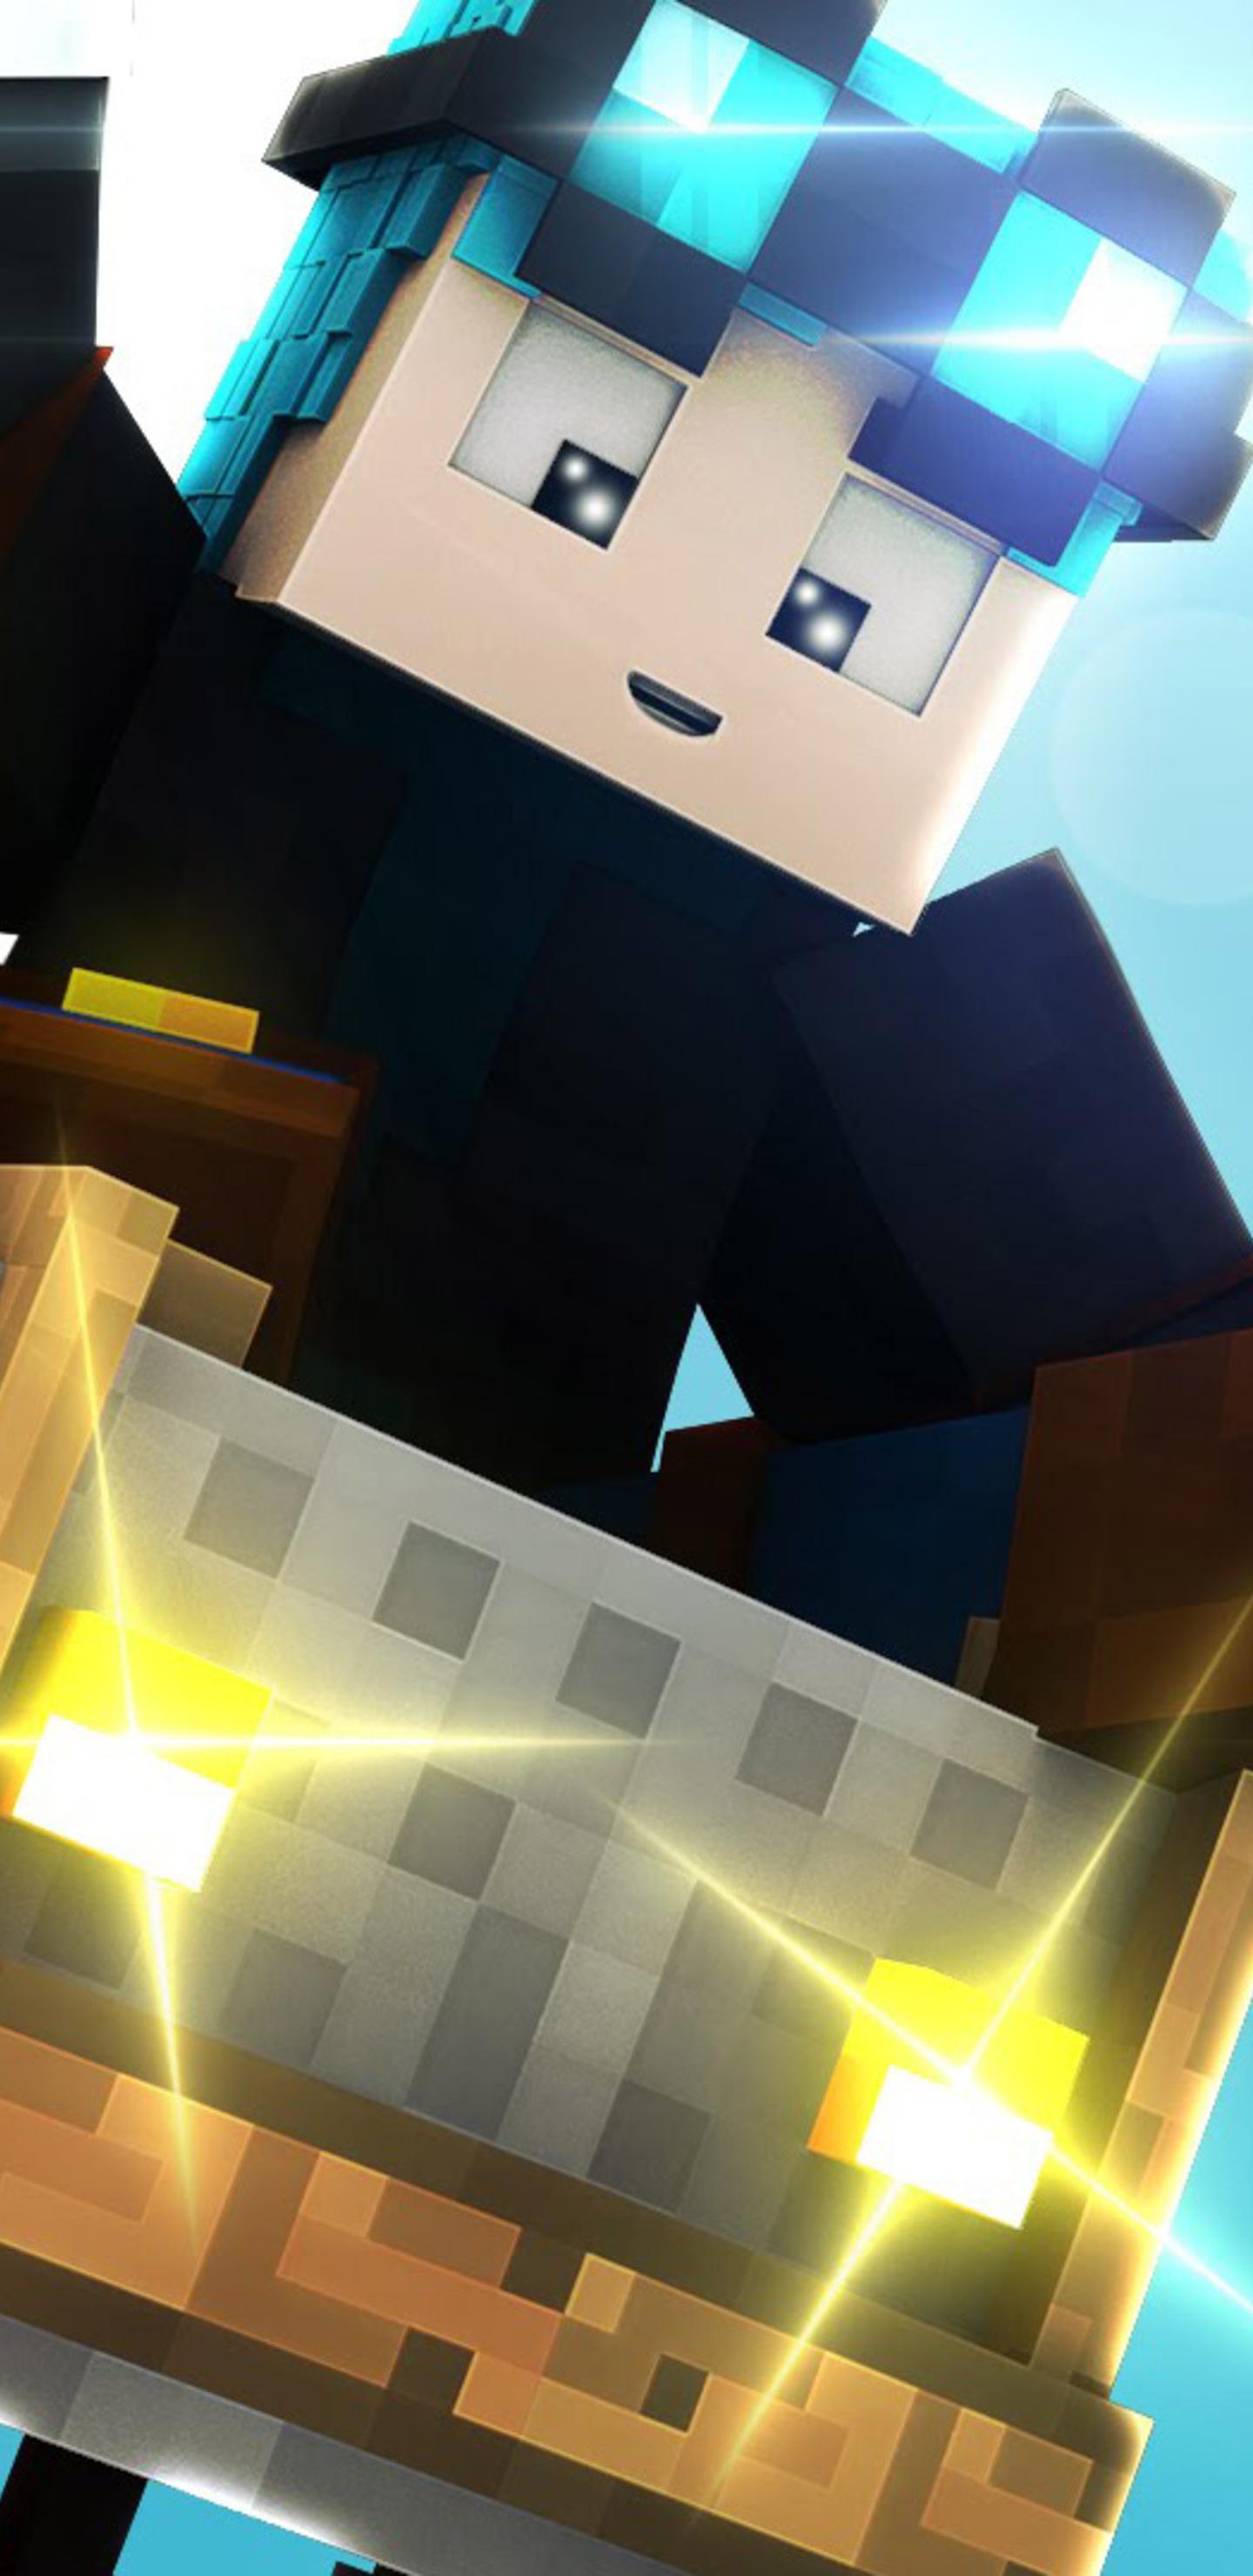 Must see Wallpaper Minecraft Samsung - minecraft-hd-qb-1440x2960  Trends_259951.jpg